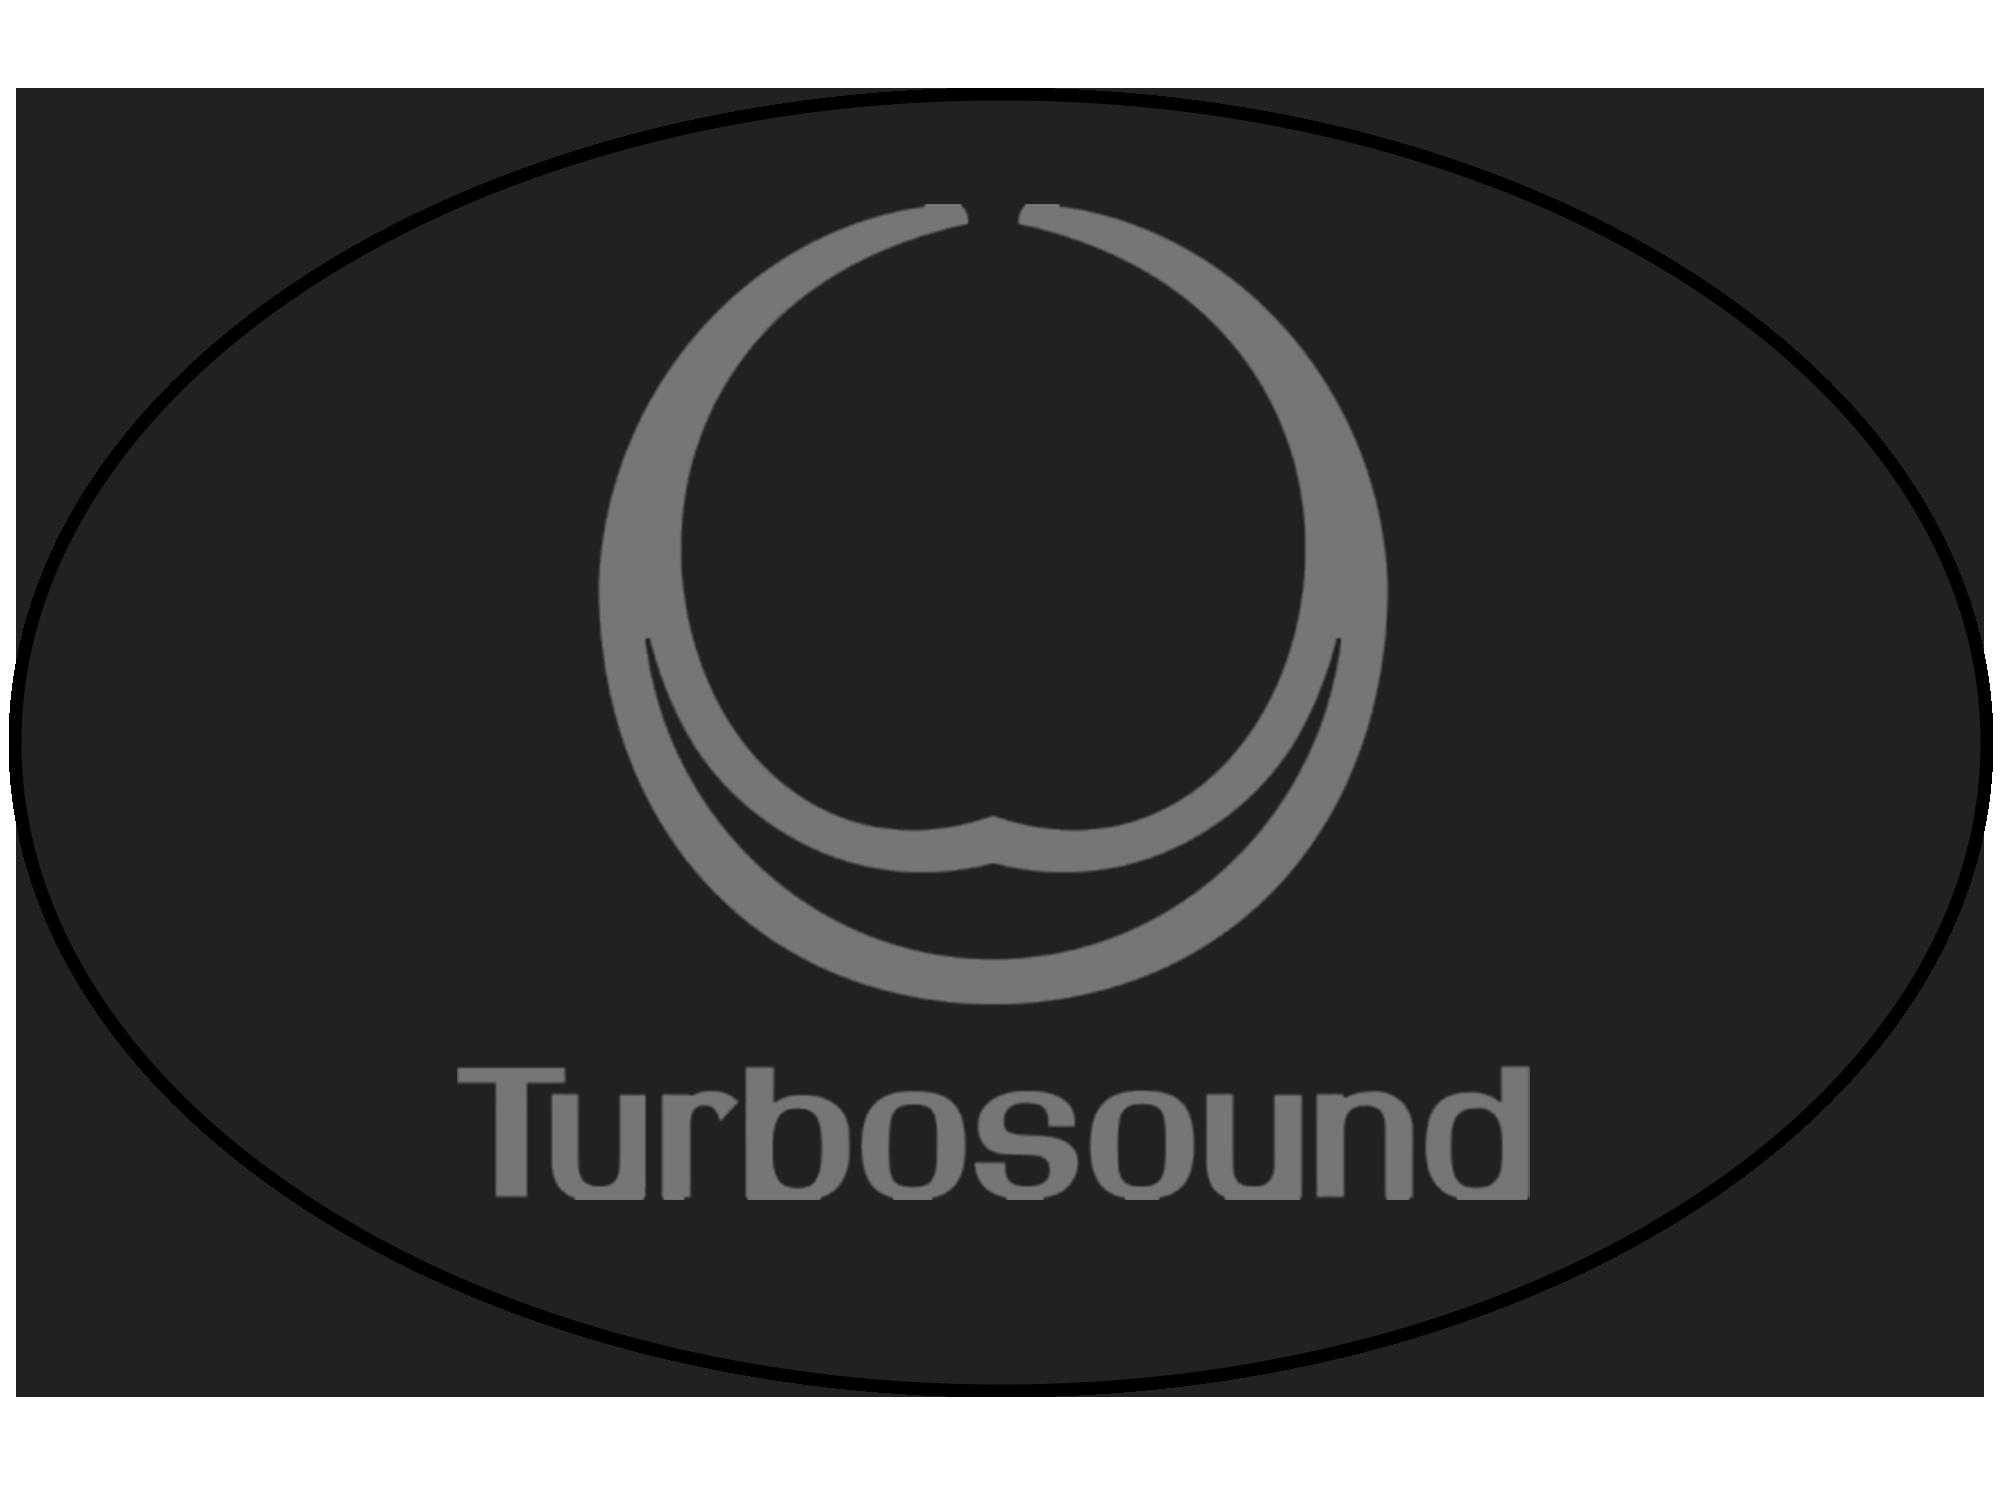 Turbosound